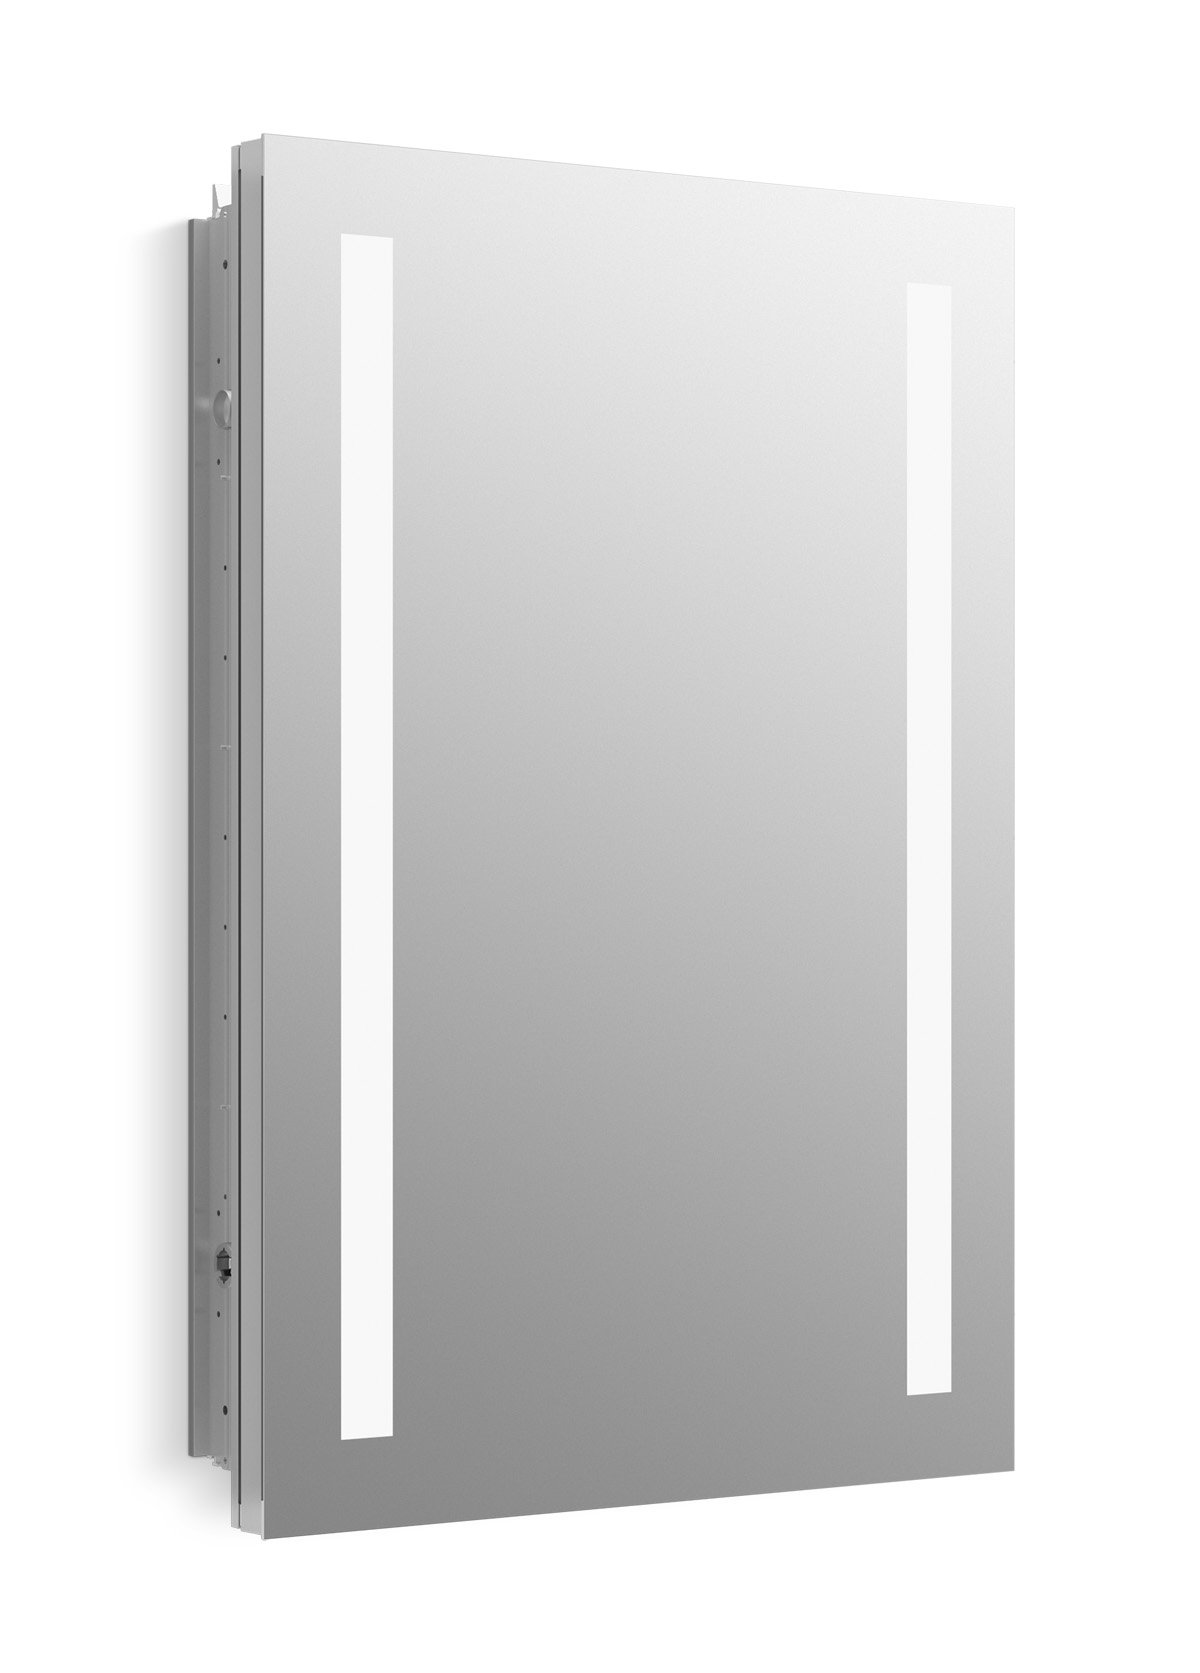 KOHLER 99003-TL-NA Verdera Lighted Medicine Cabinet, Aluminum